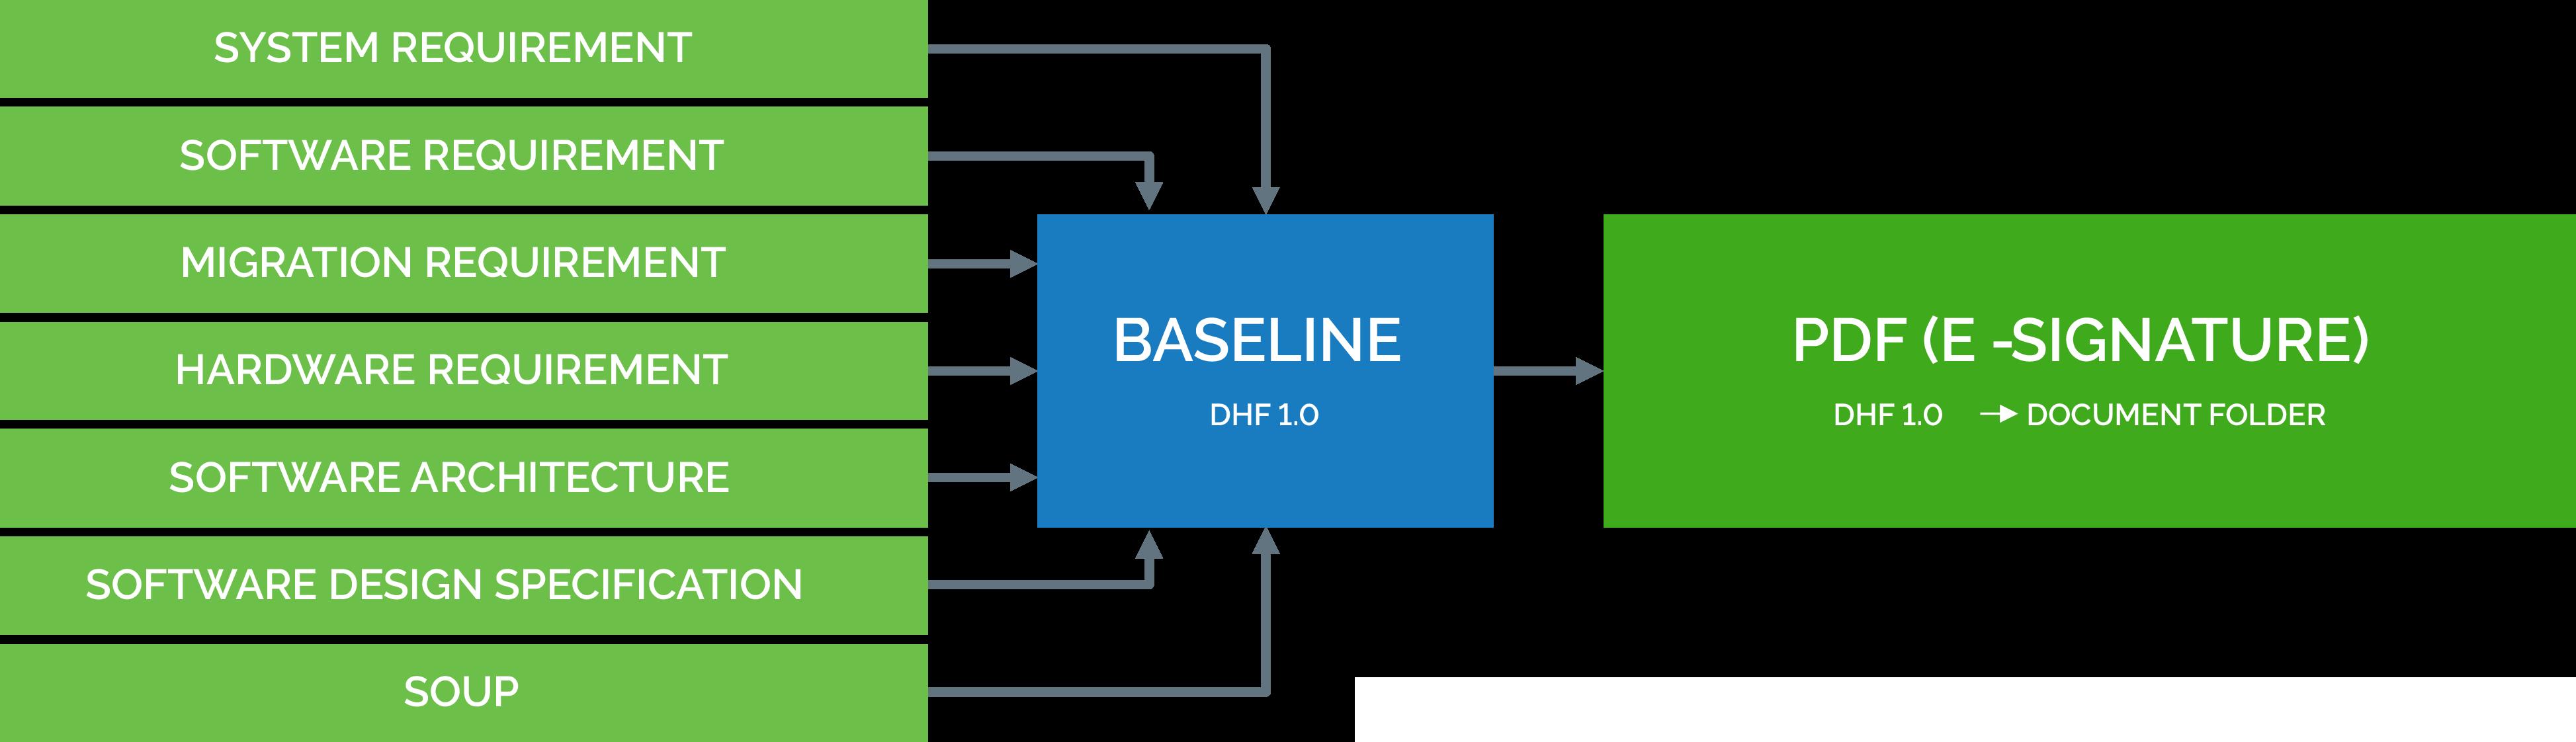 design-history-tile-1 Requirements, Risk, and Test Management for Medical Device Developers